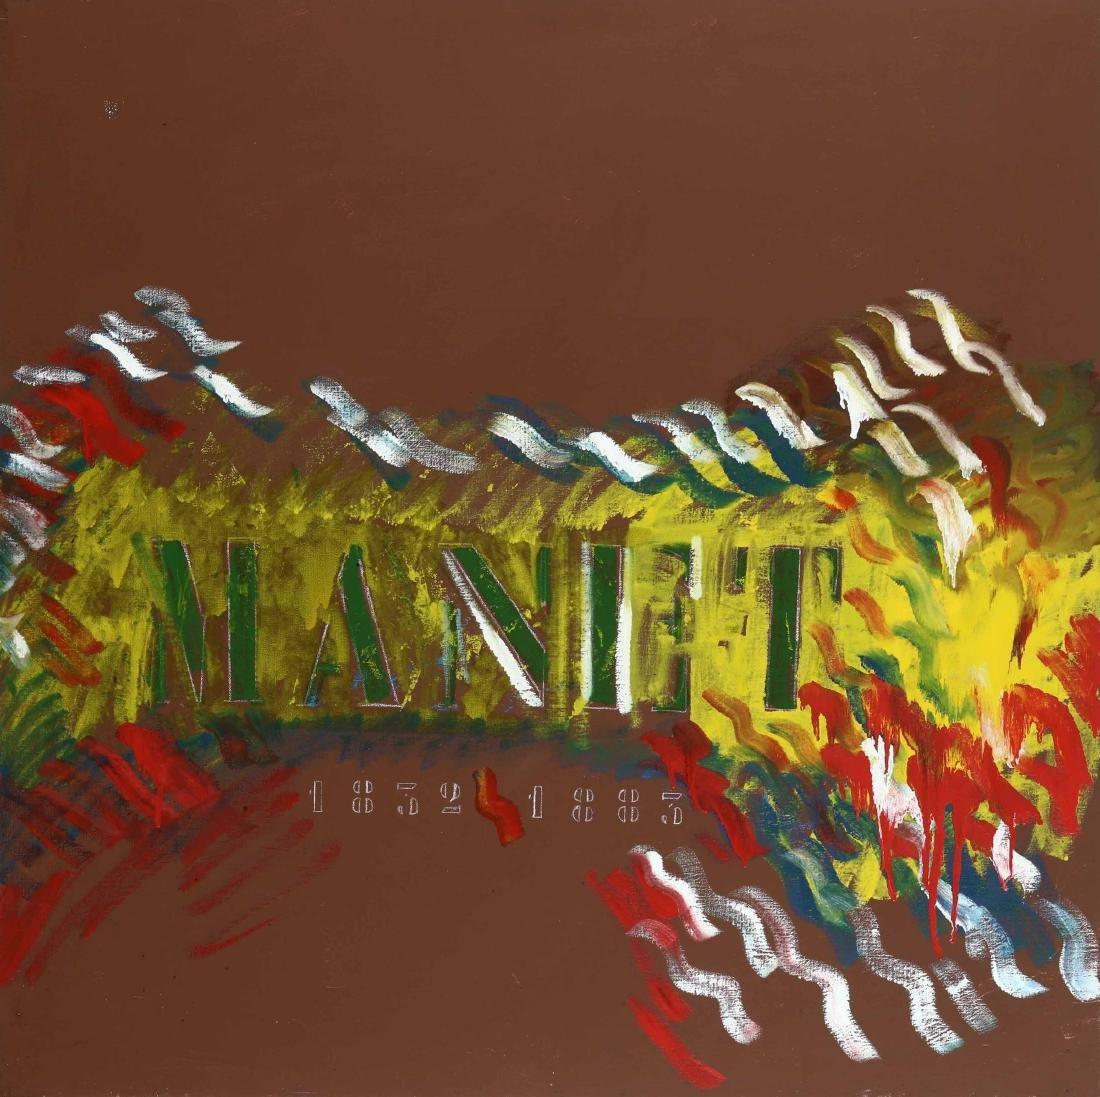 Tano Festa (1938-1988), Manet 1981